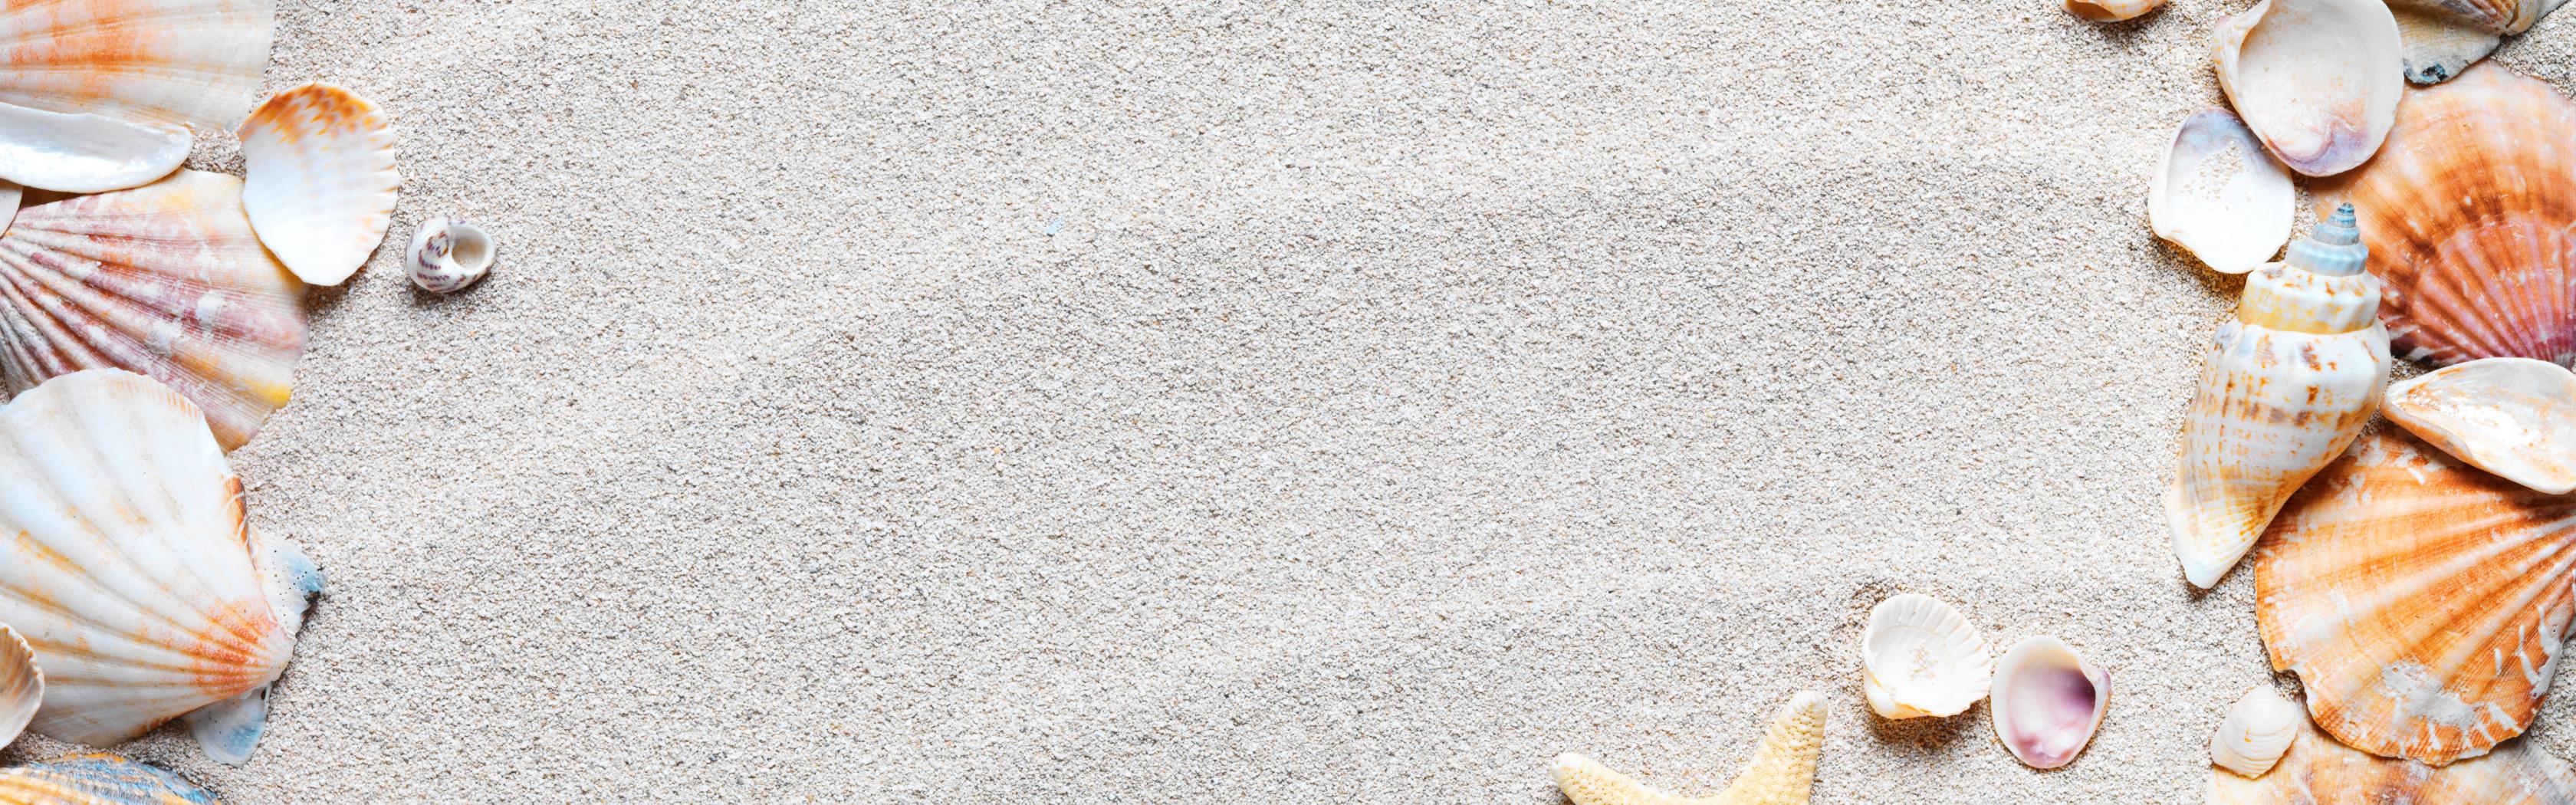 Картинка ракушки для текста